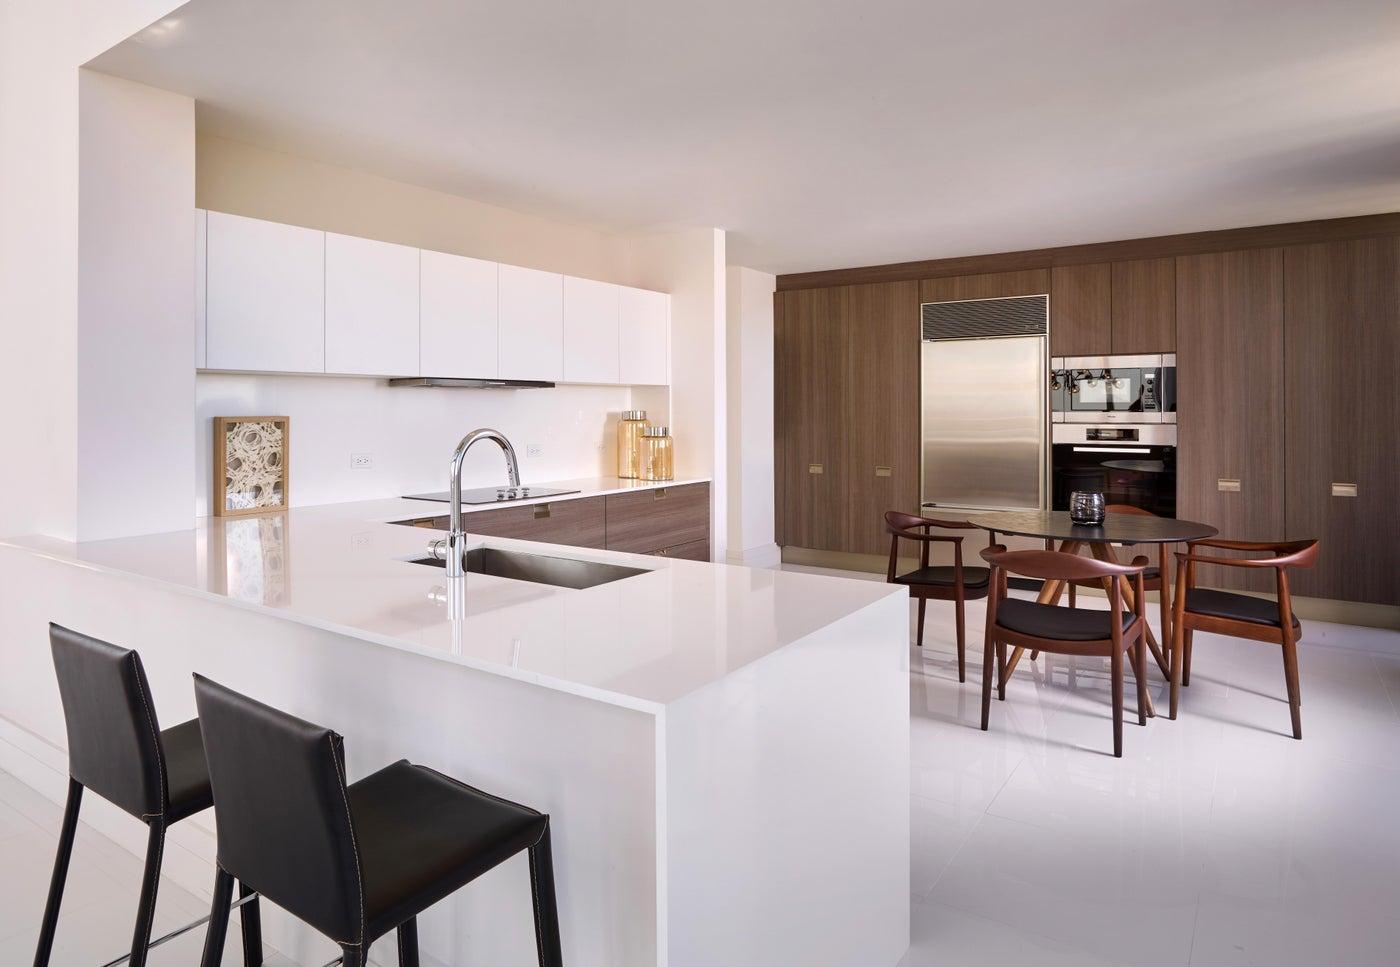 Midtown Model Unit PH6 - Kitchen